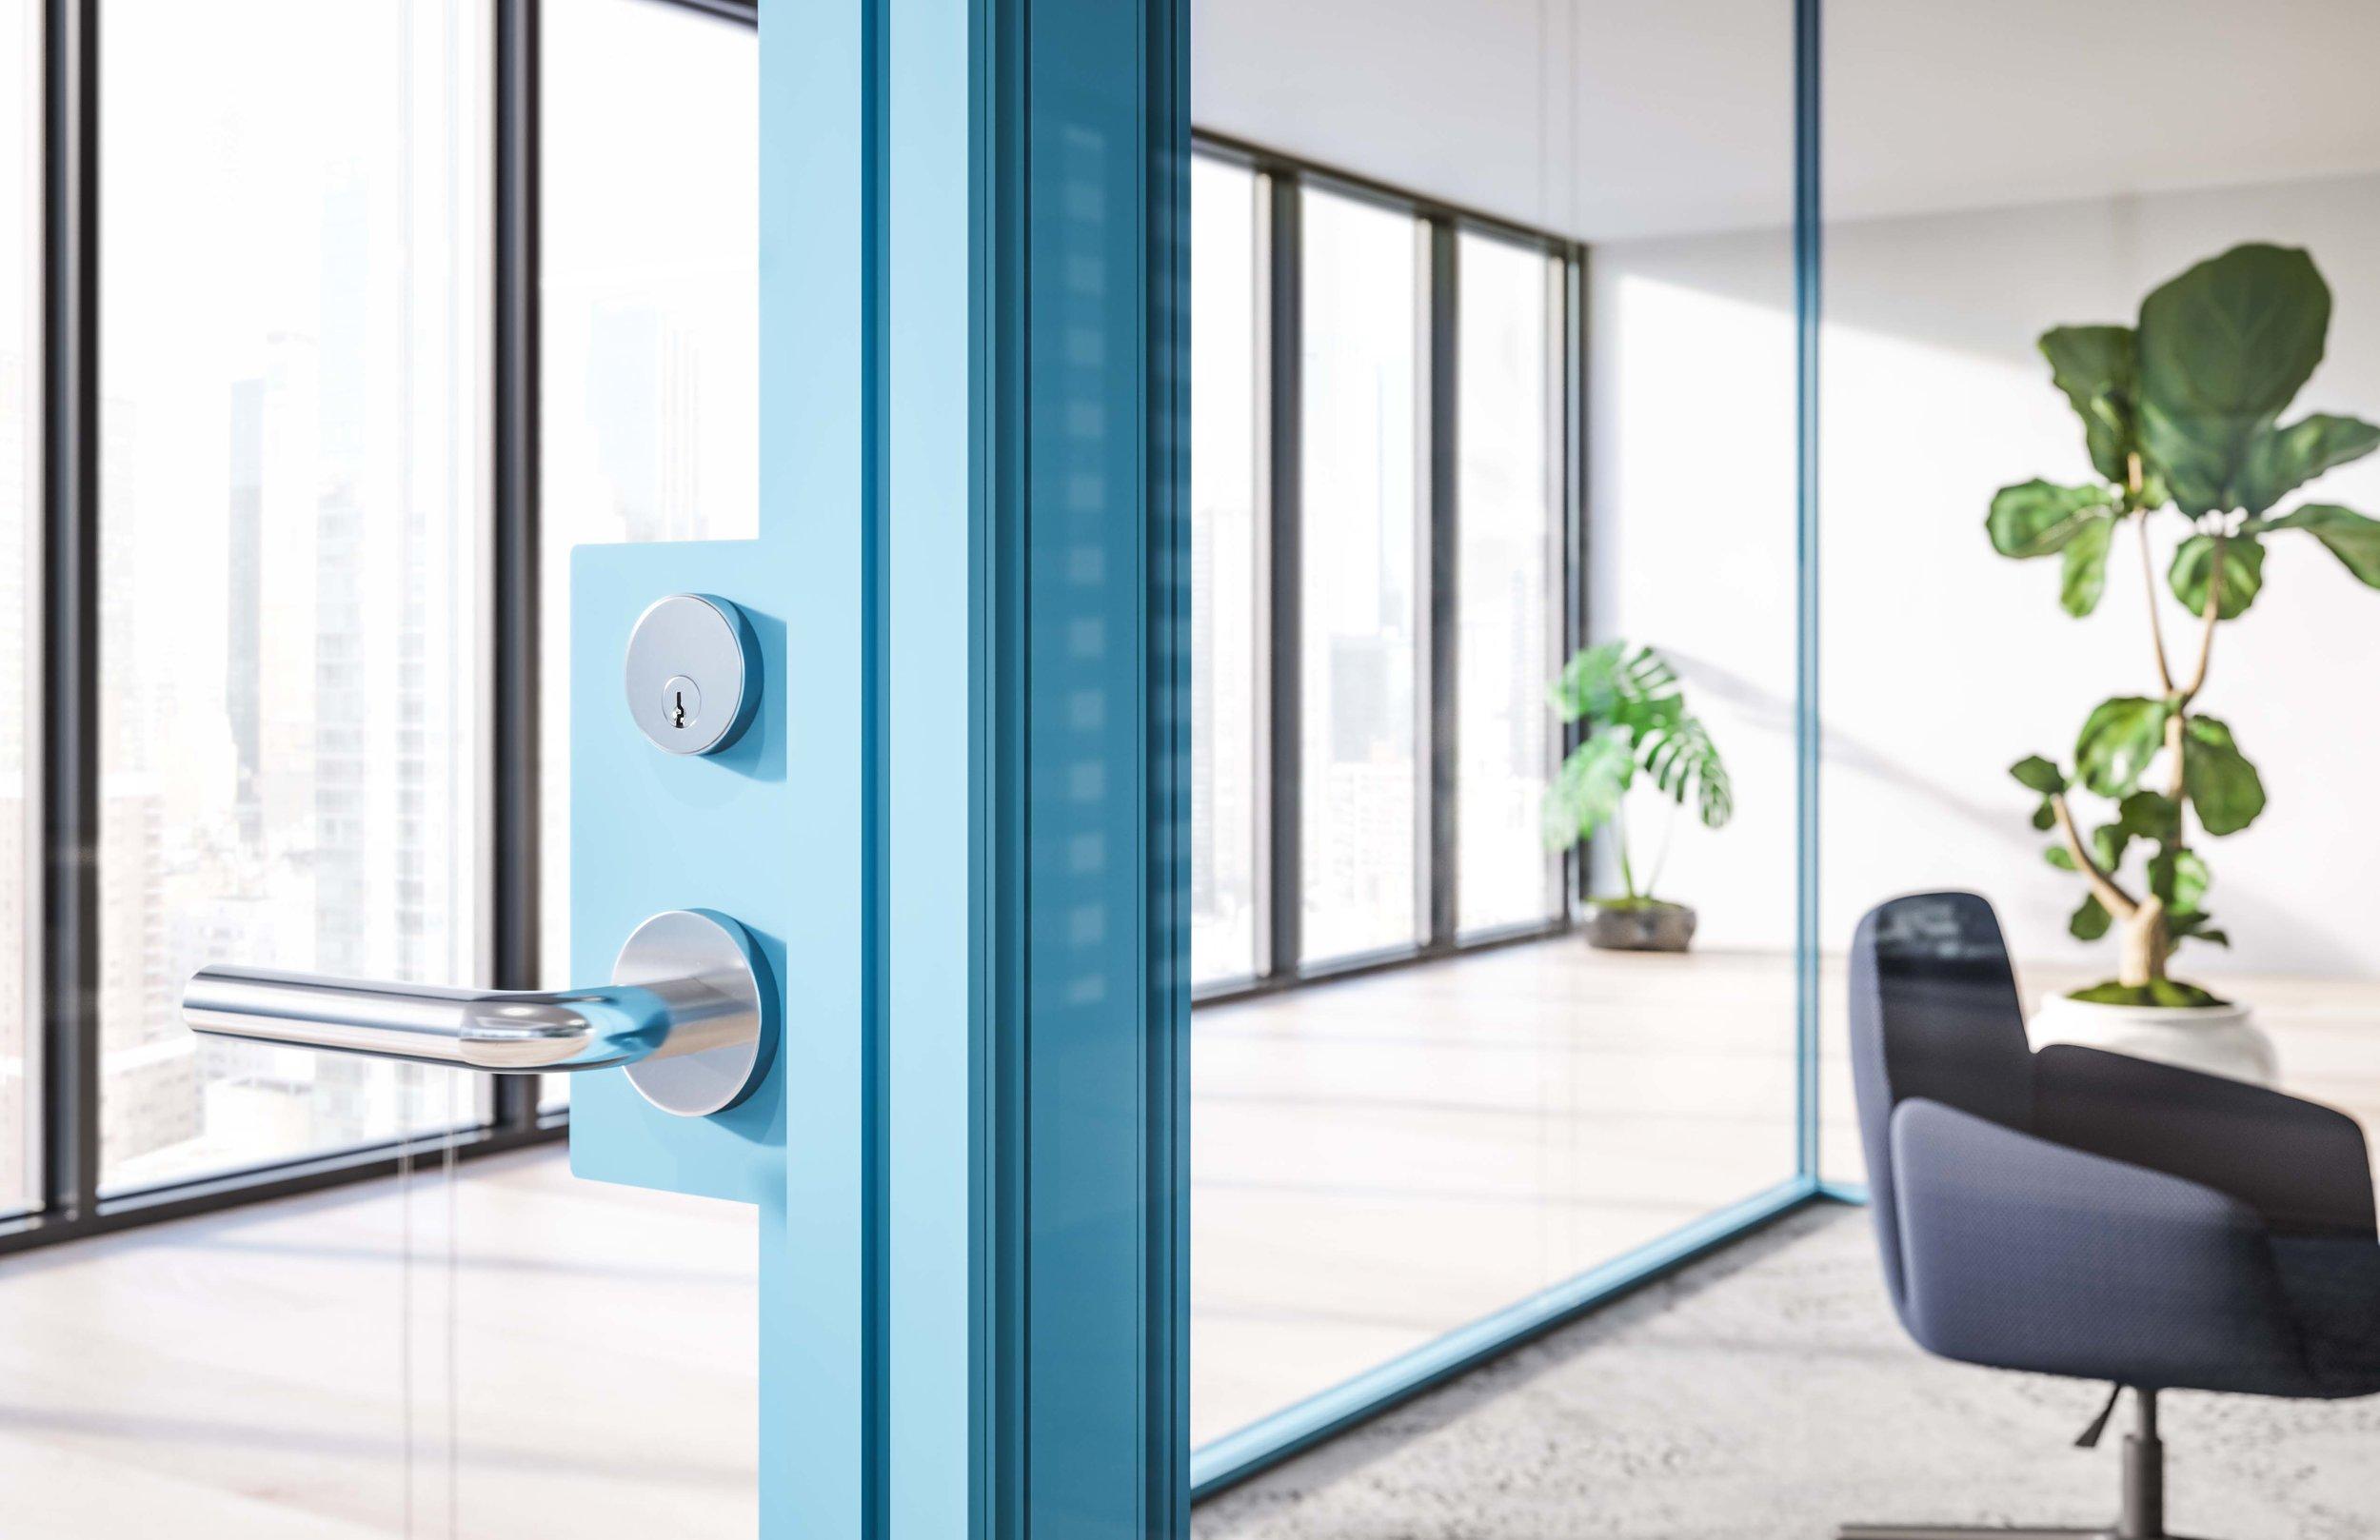 6.98916.0.Enclose Frameless Glass Haworth Moveable Walls.jpg